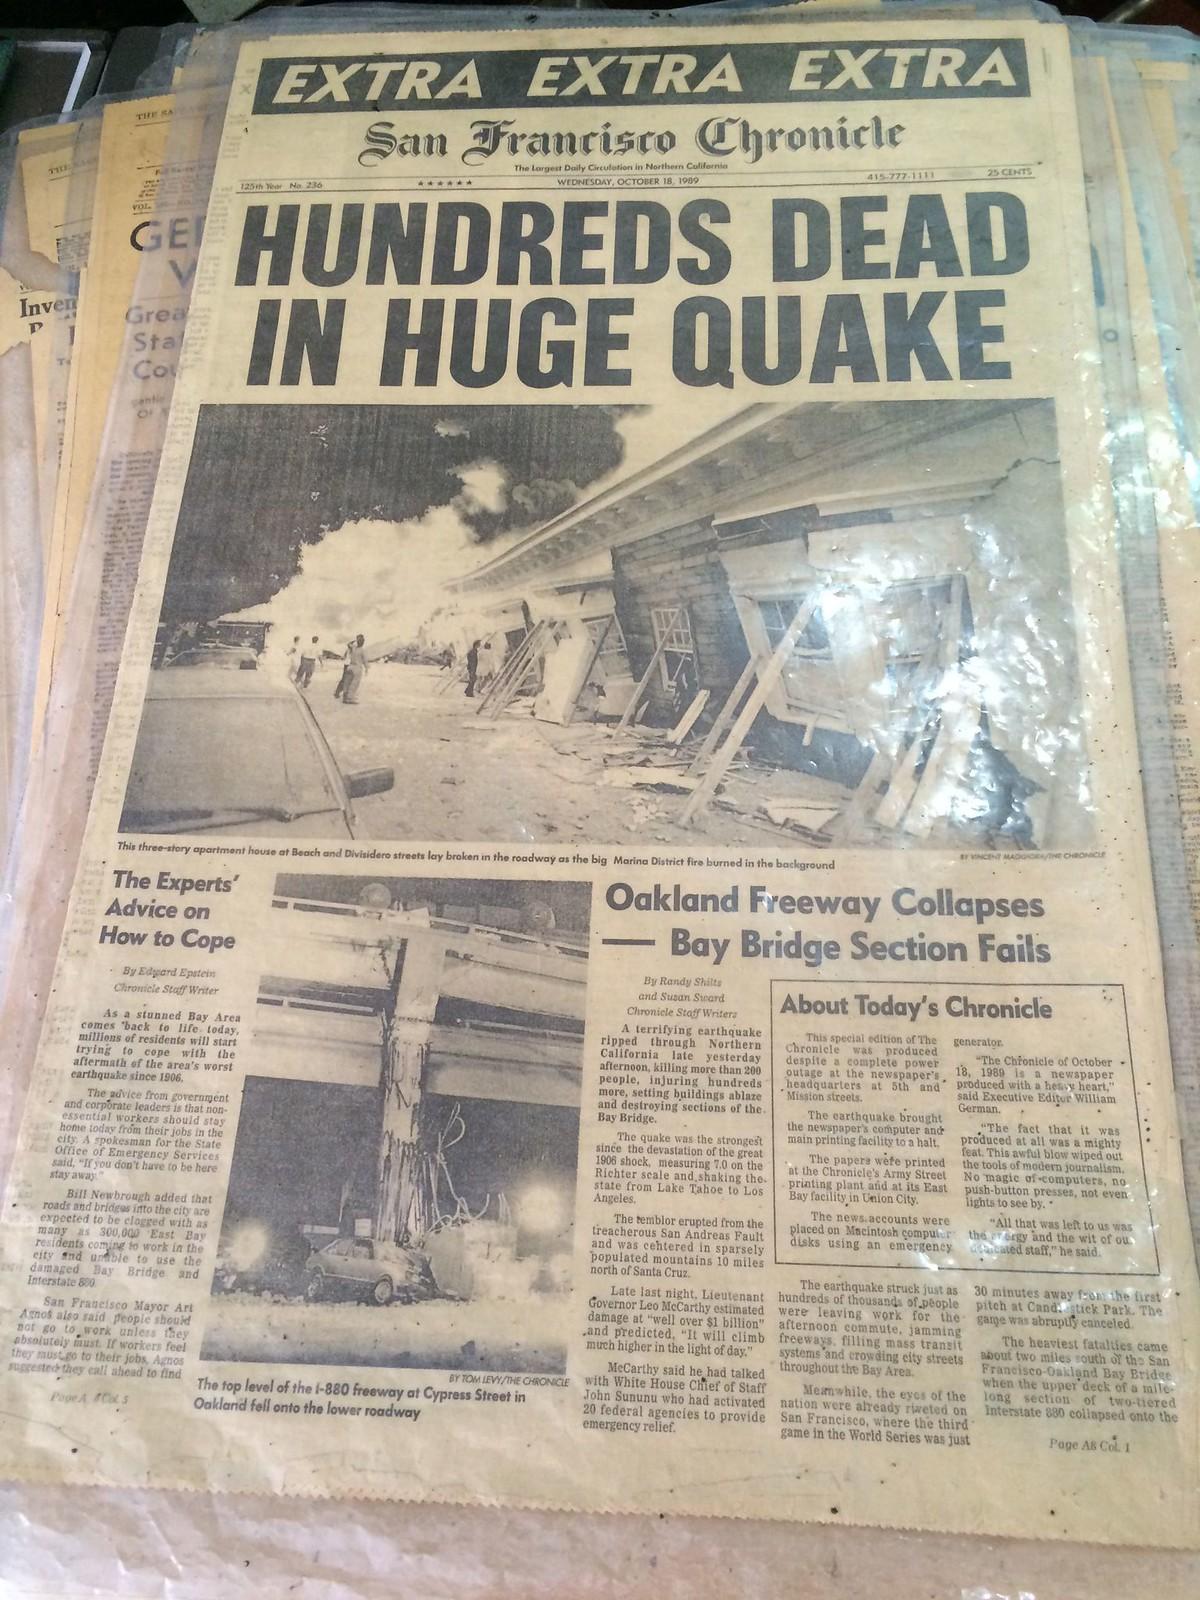 Headlines from the devastating 1989 earthquake